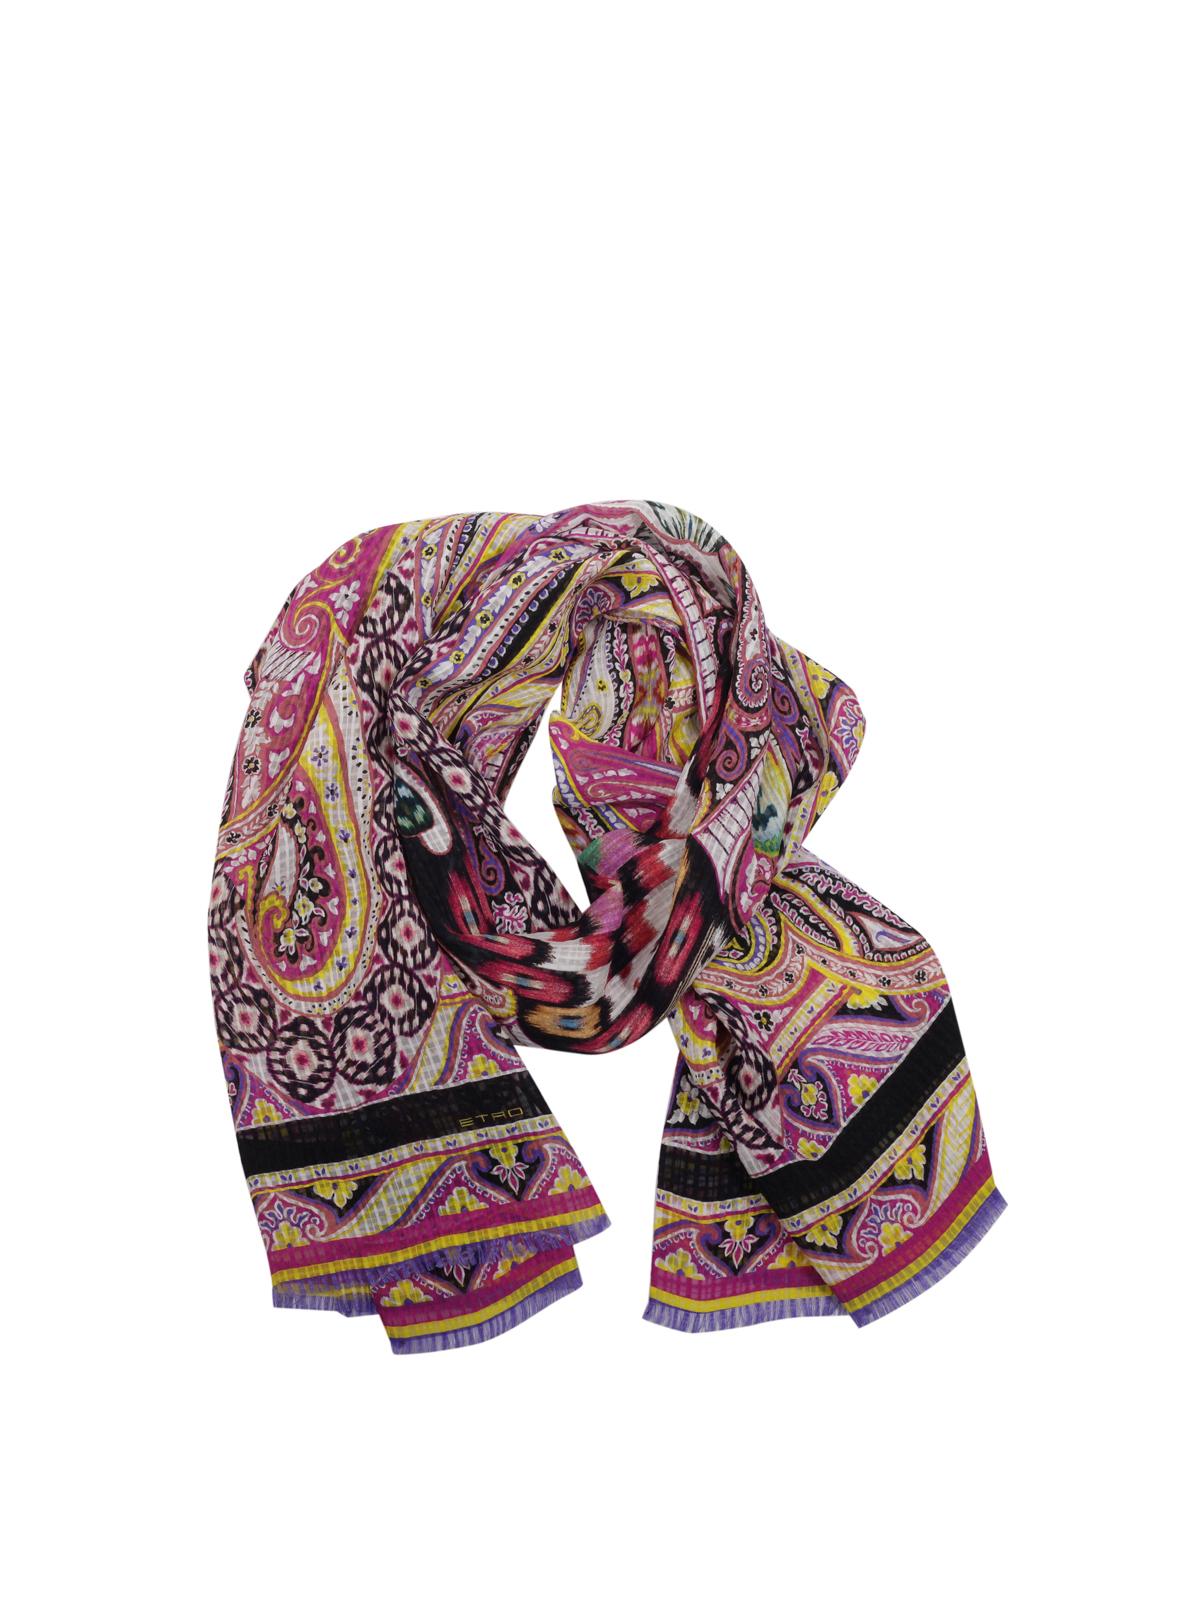 Paisley print silk scarf by Etro